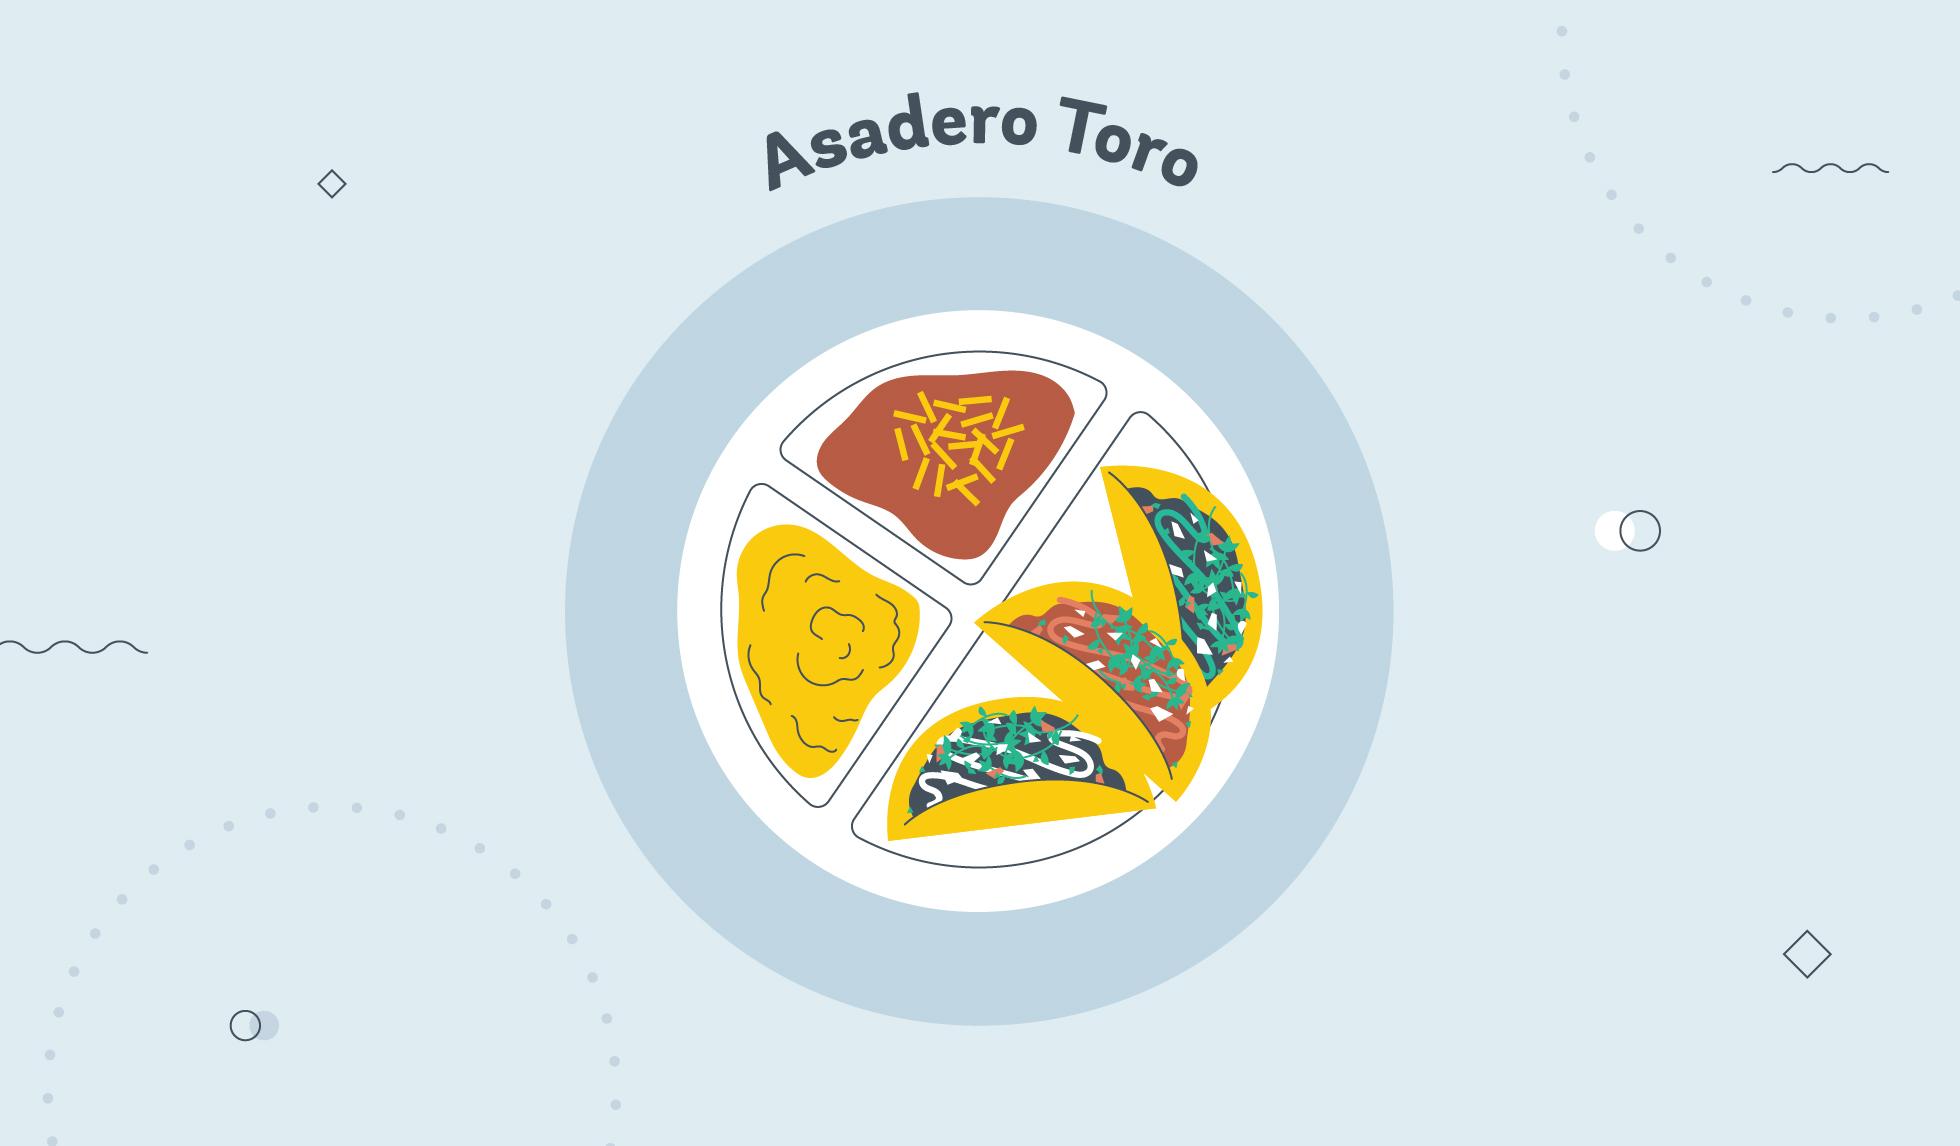 Asadero Toro taco graphic